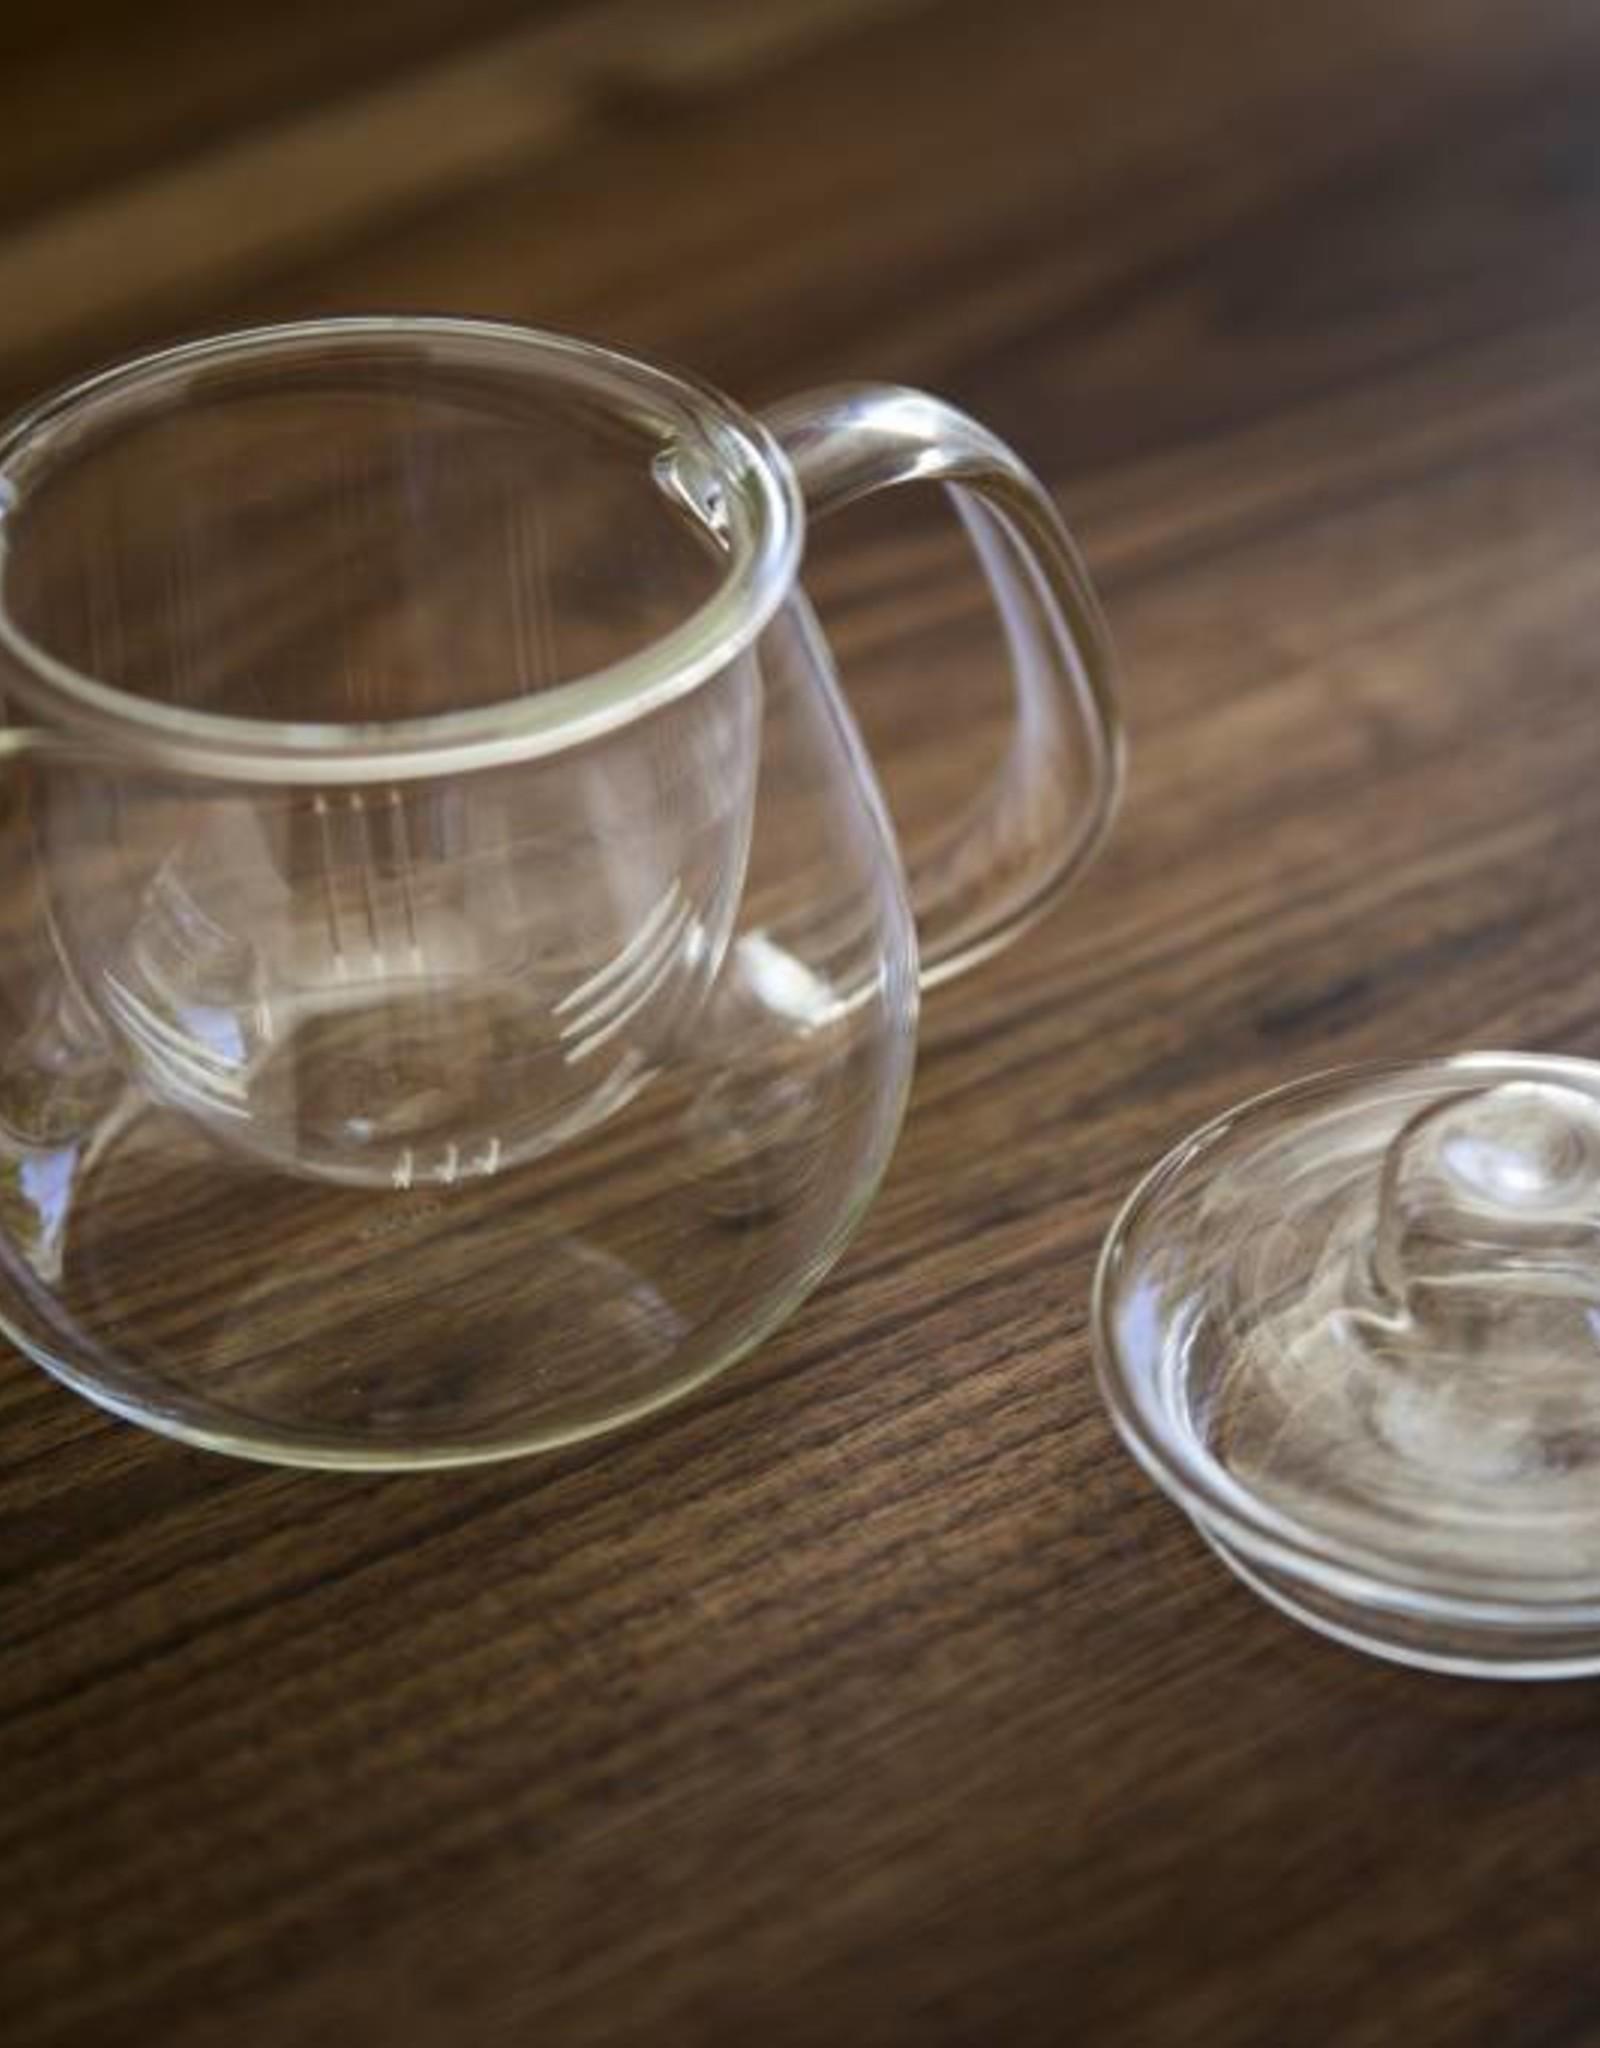 Kinto Heat-resistant glass teapot set - small